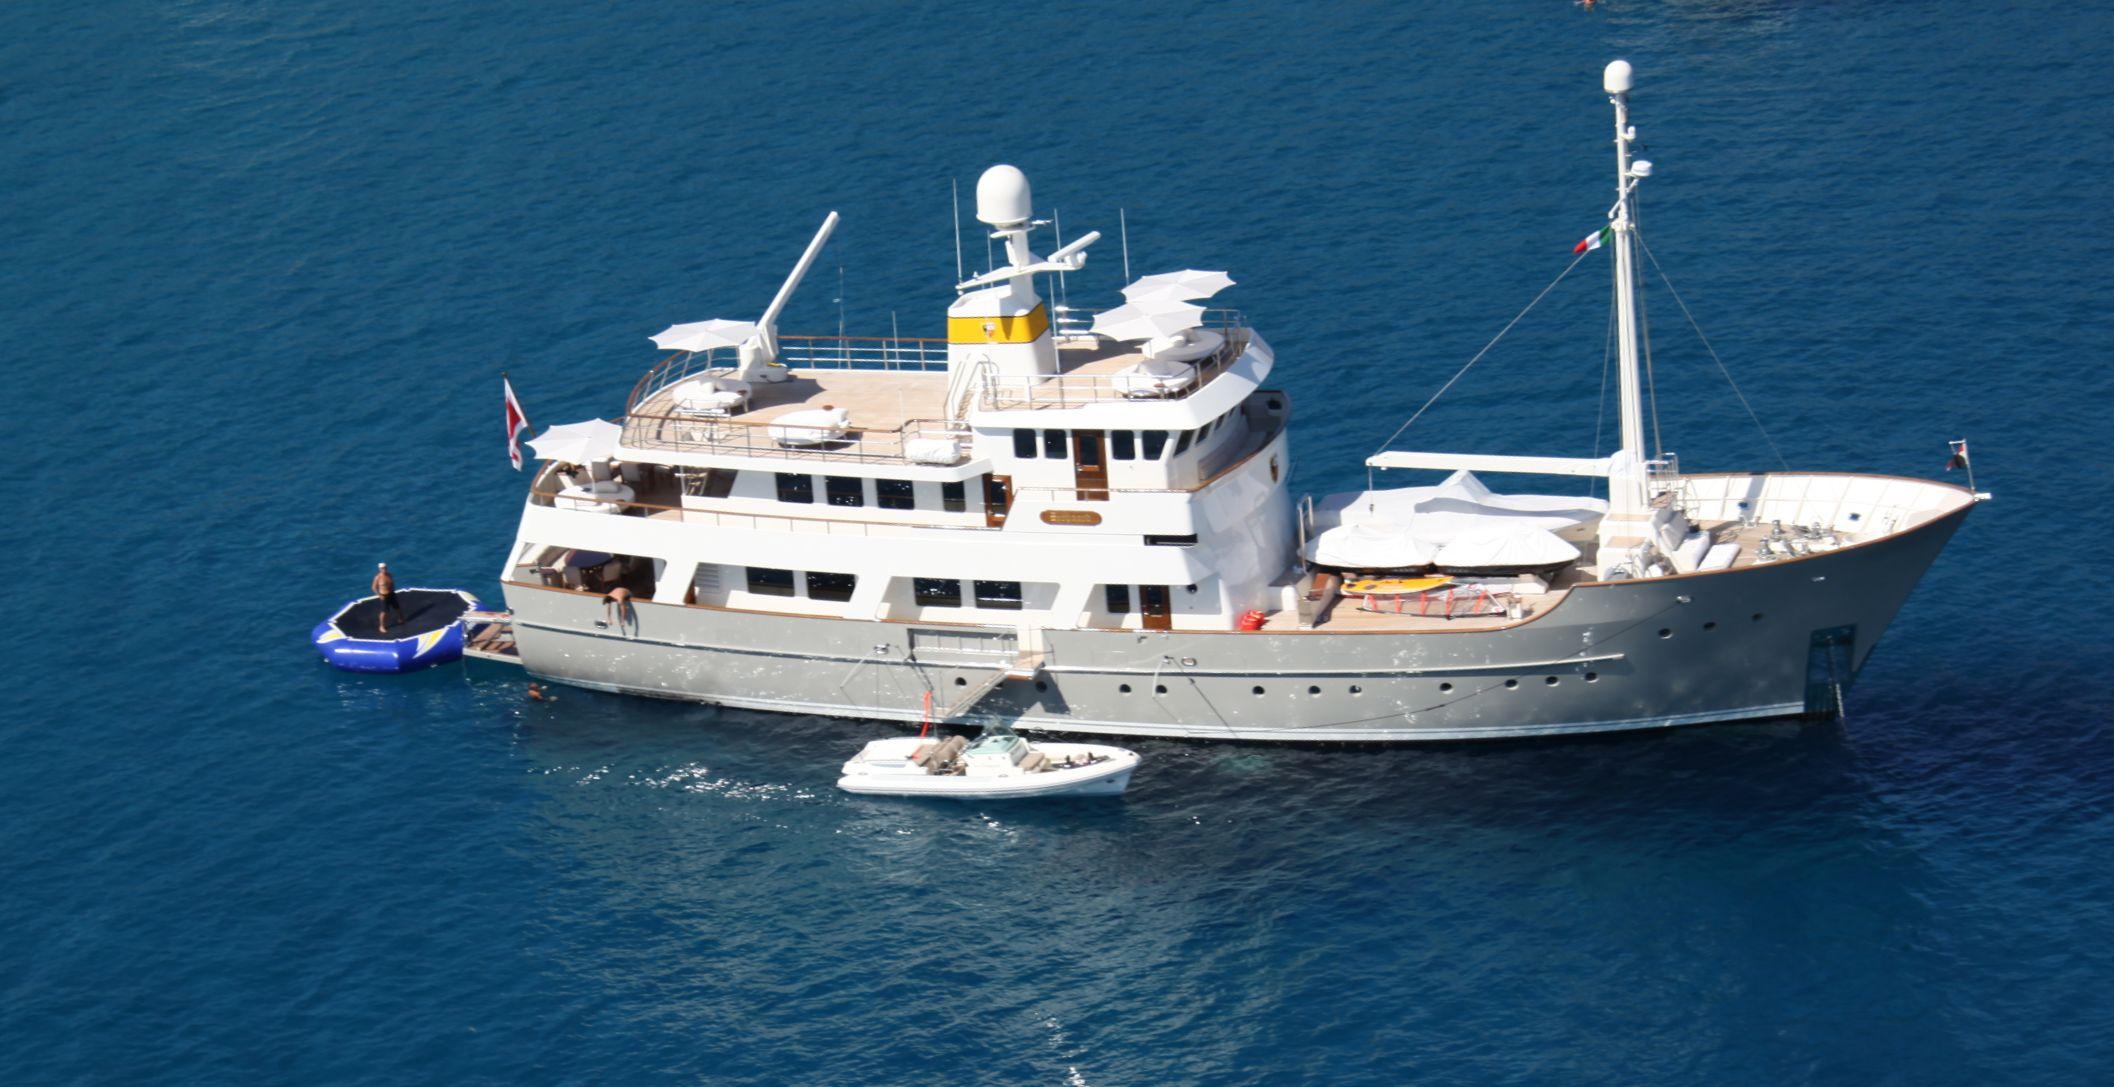 Yacht Expedition Zeepaard A Jfa Yachts Superyacht